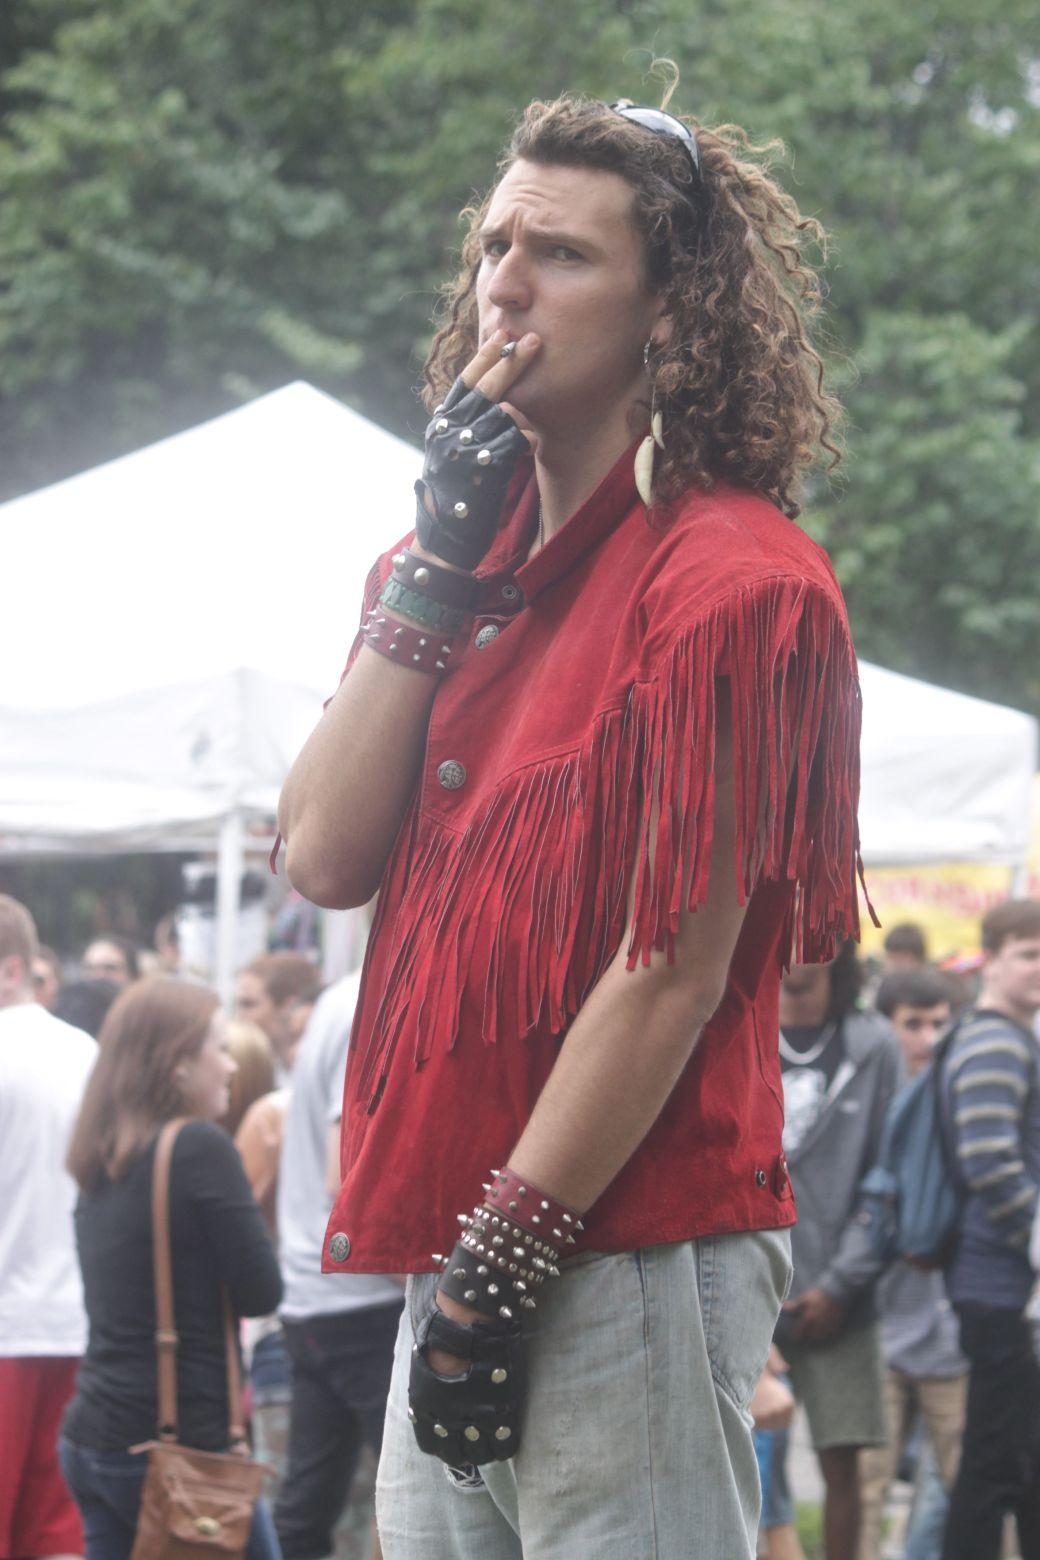 boston hemp fest 2013 man in red fringe jacket smoking